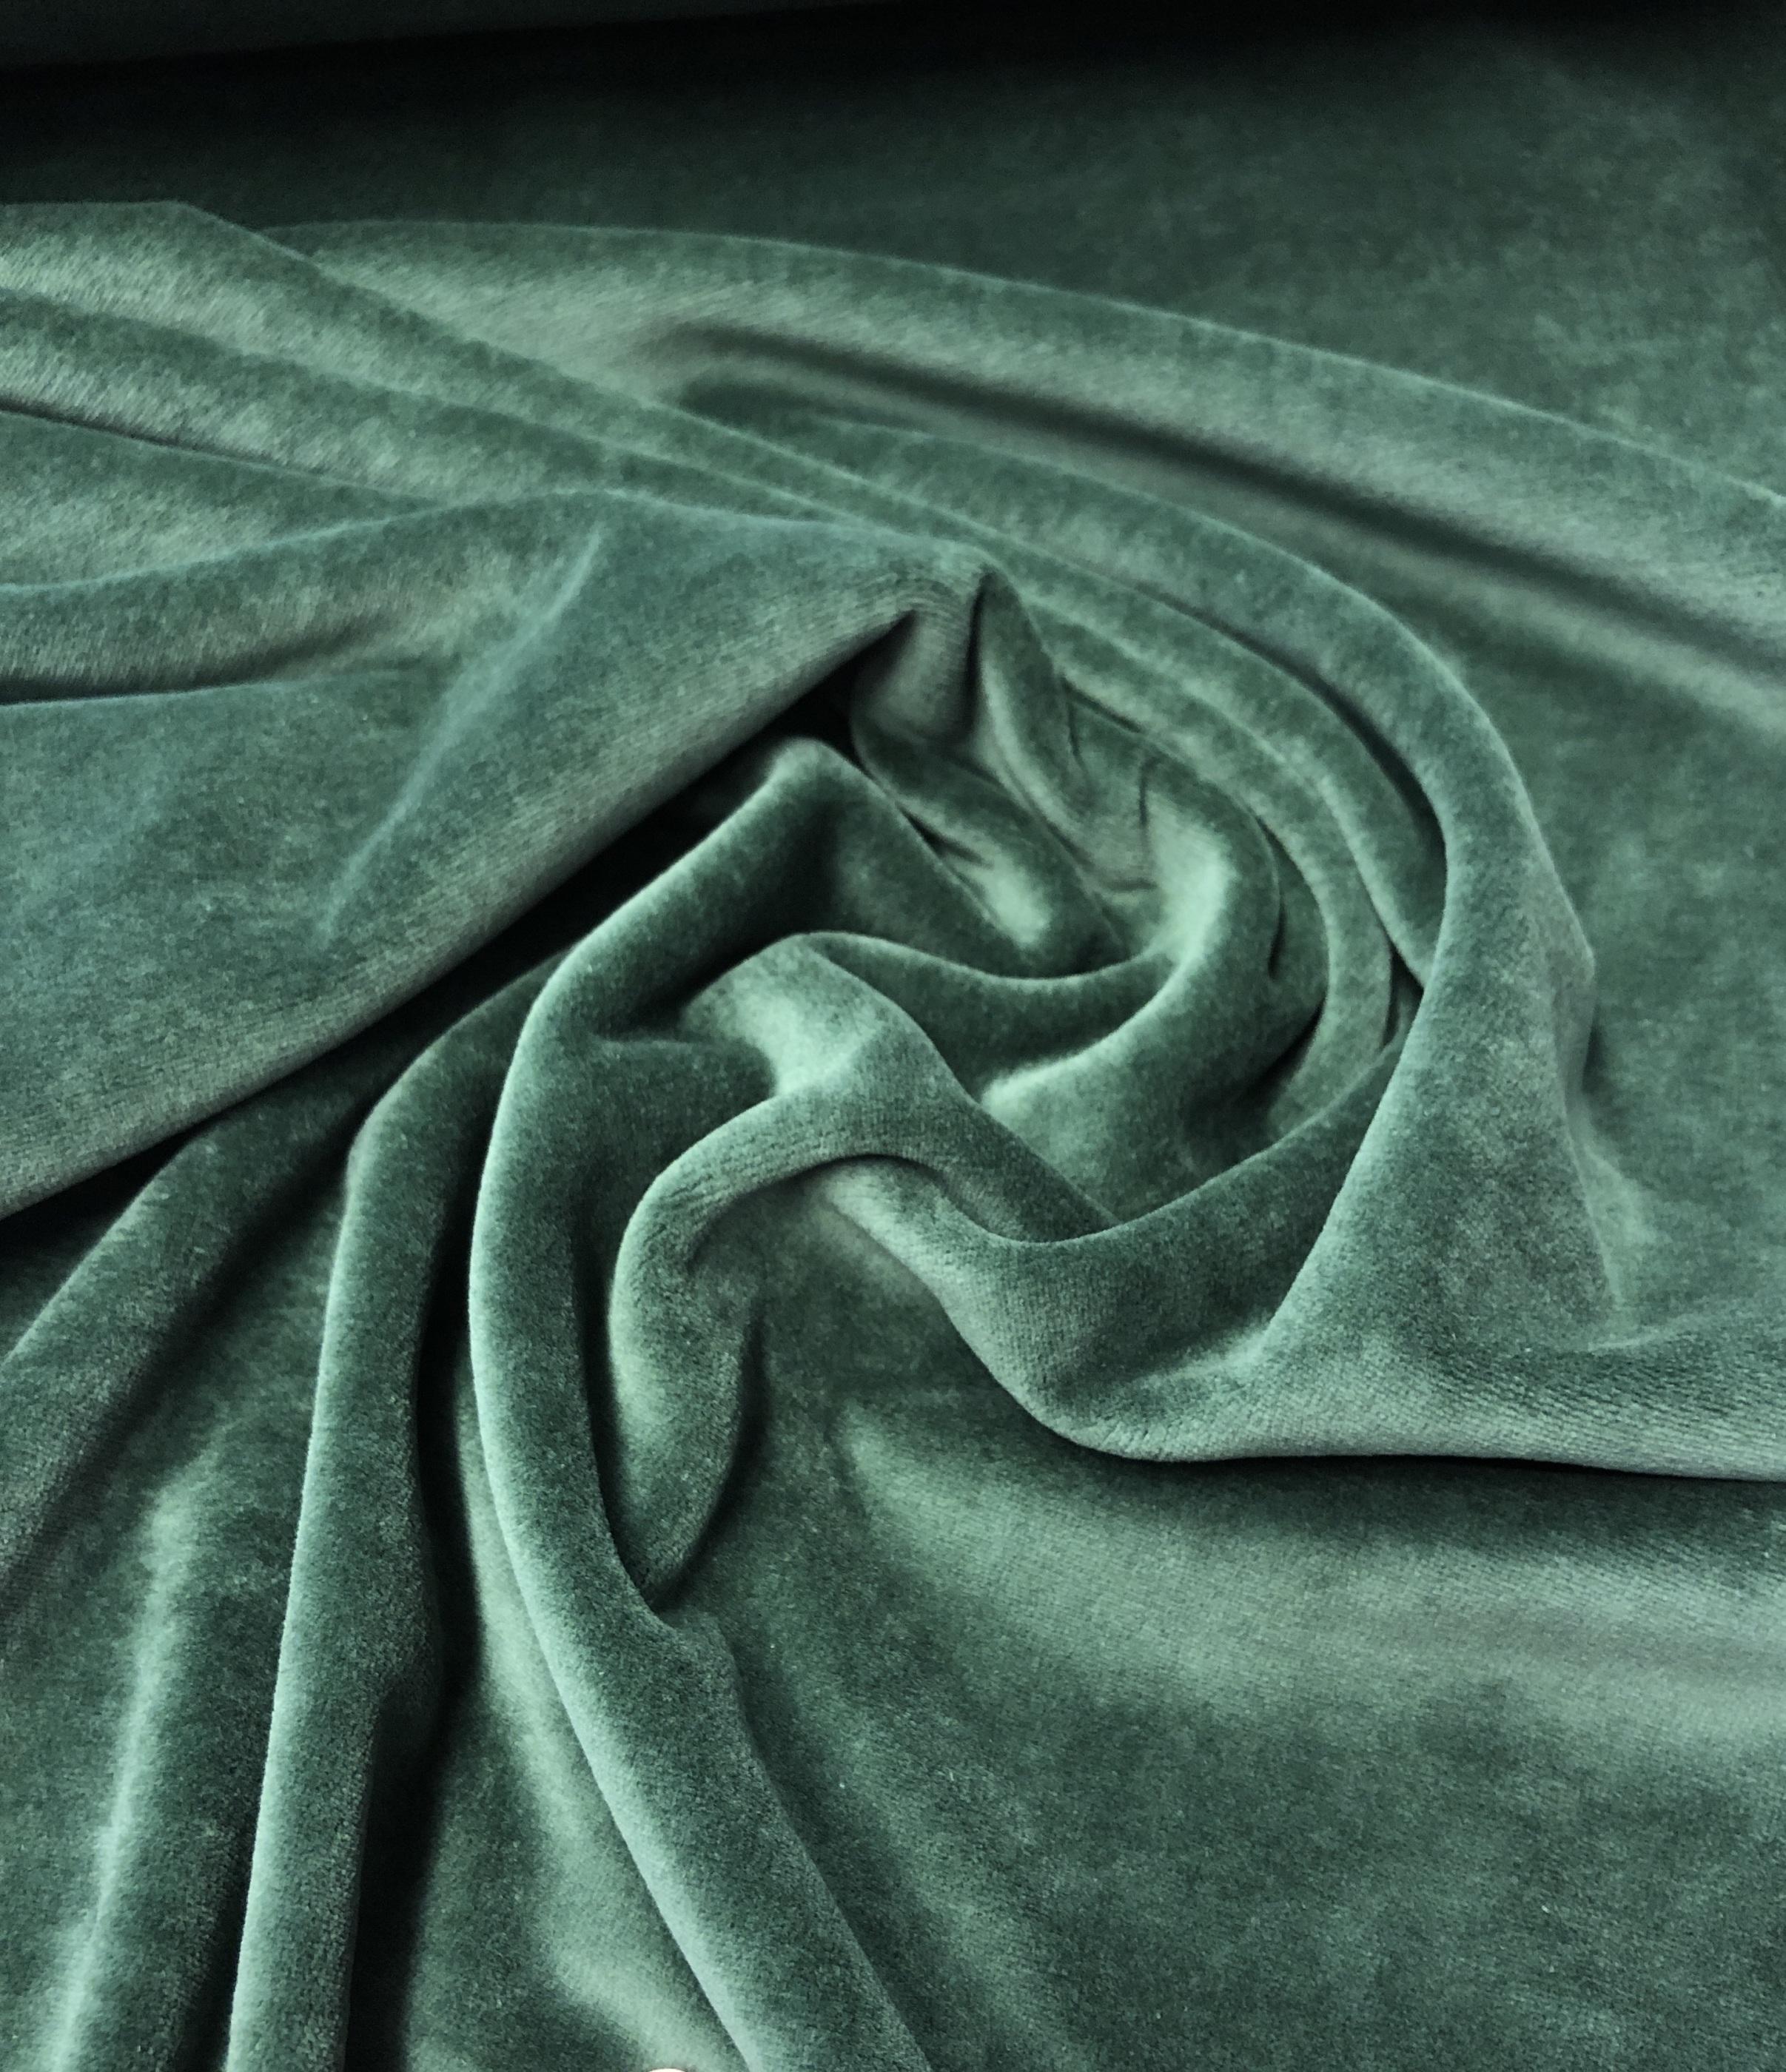 velour stretch stretchvelour grön modetyg metervara laholm tyglust